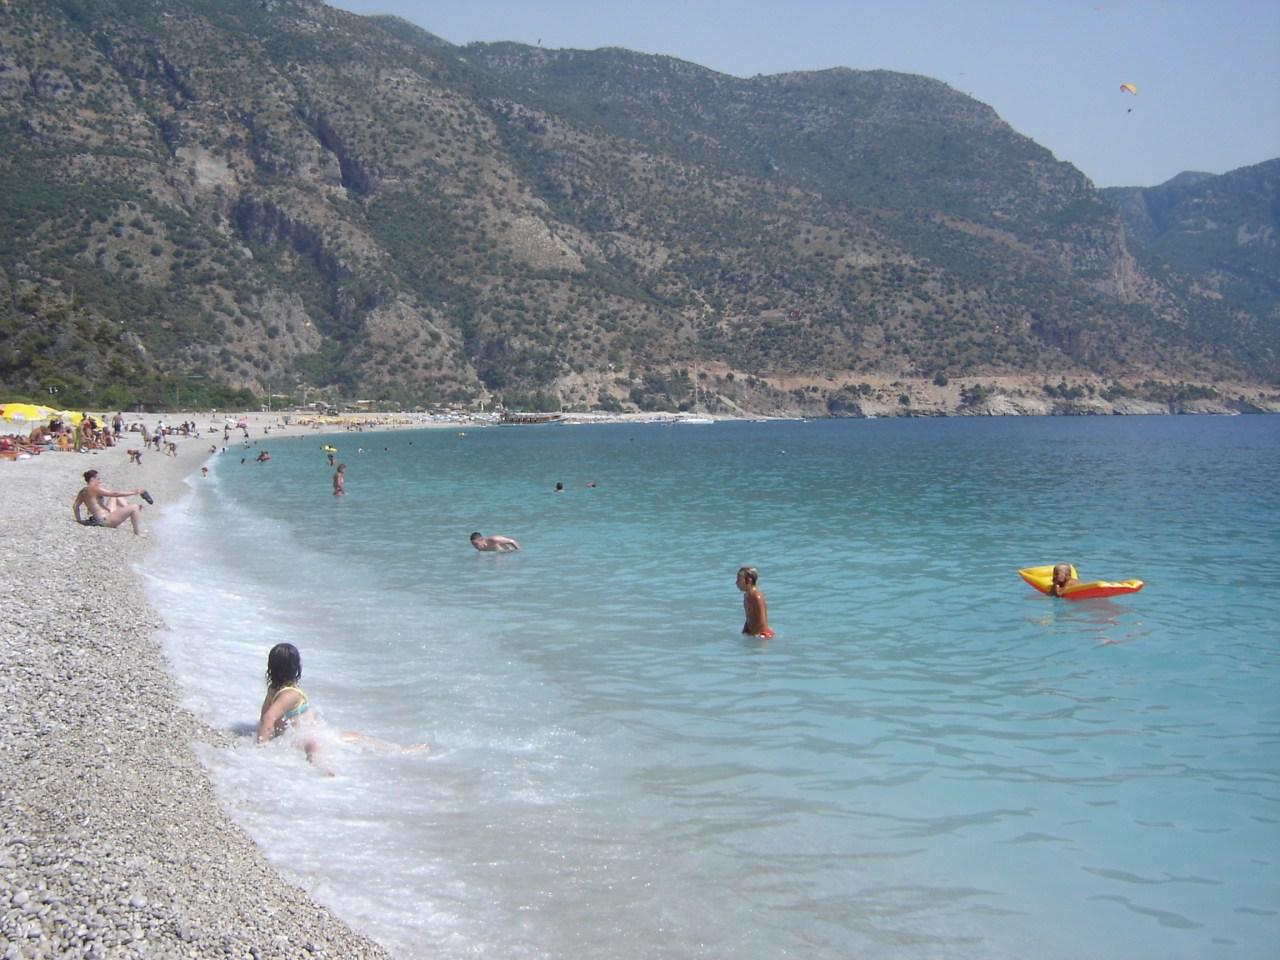 Trip to Turkey - Stunning Cities and Beautiful Coastline 5